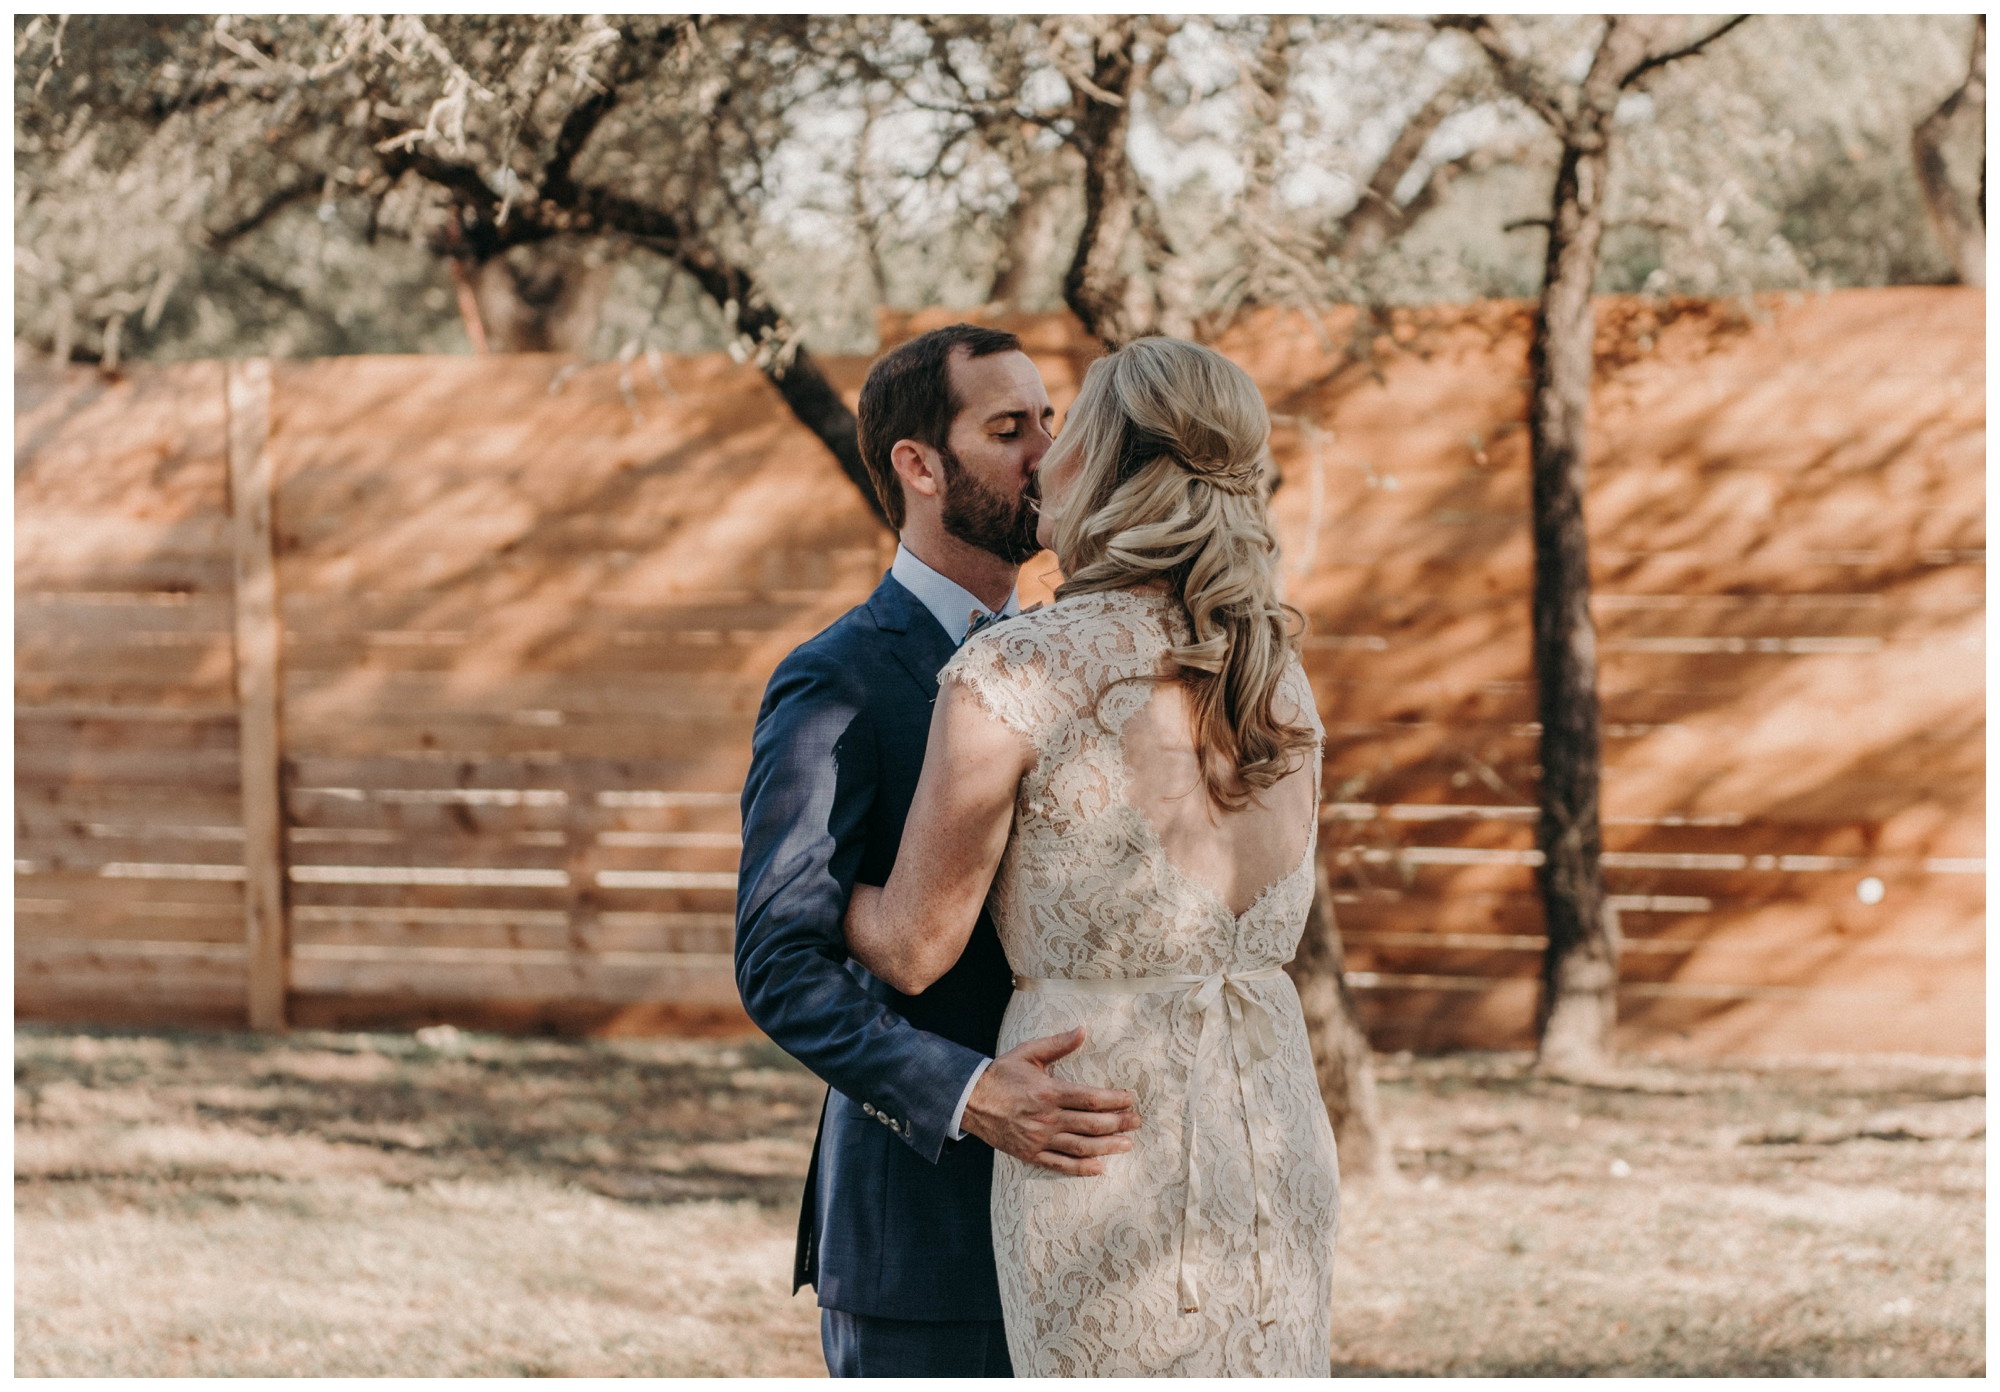 austin-texas-wedding-photography-1778-photographie_0042.jpg